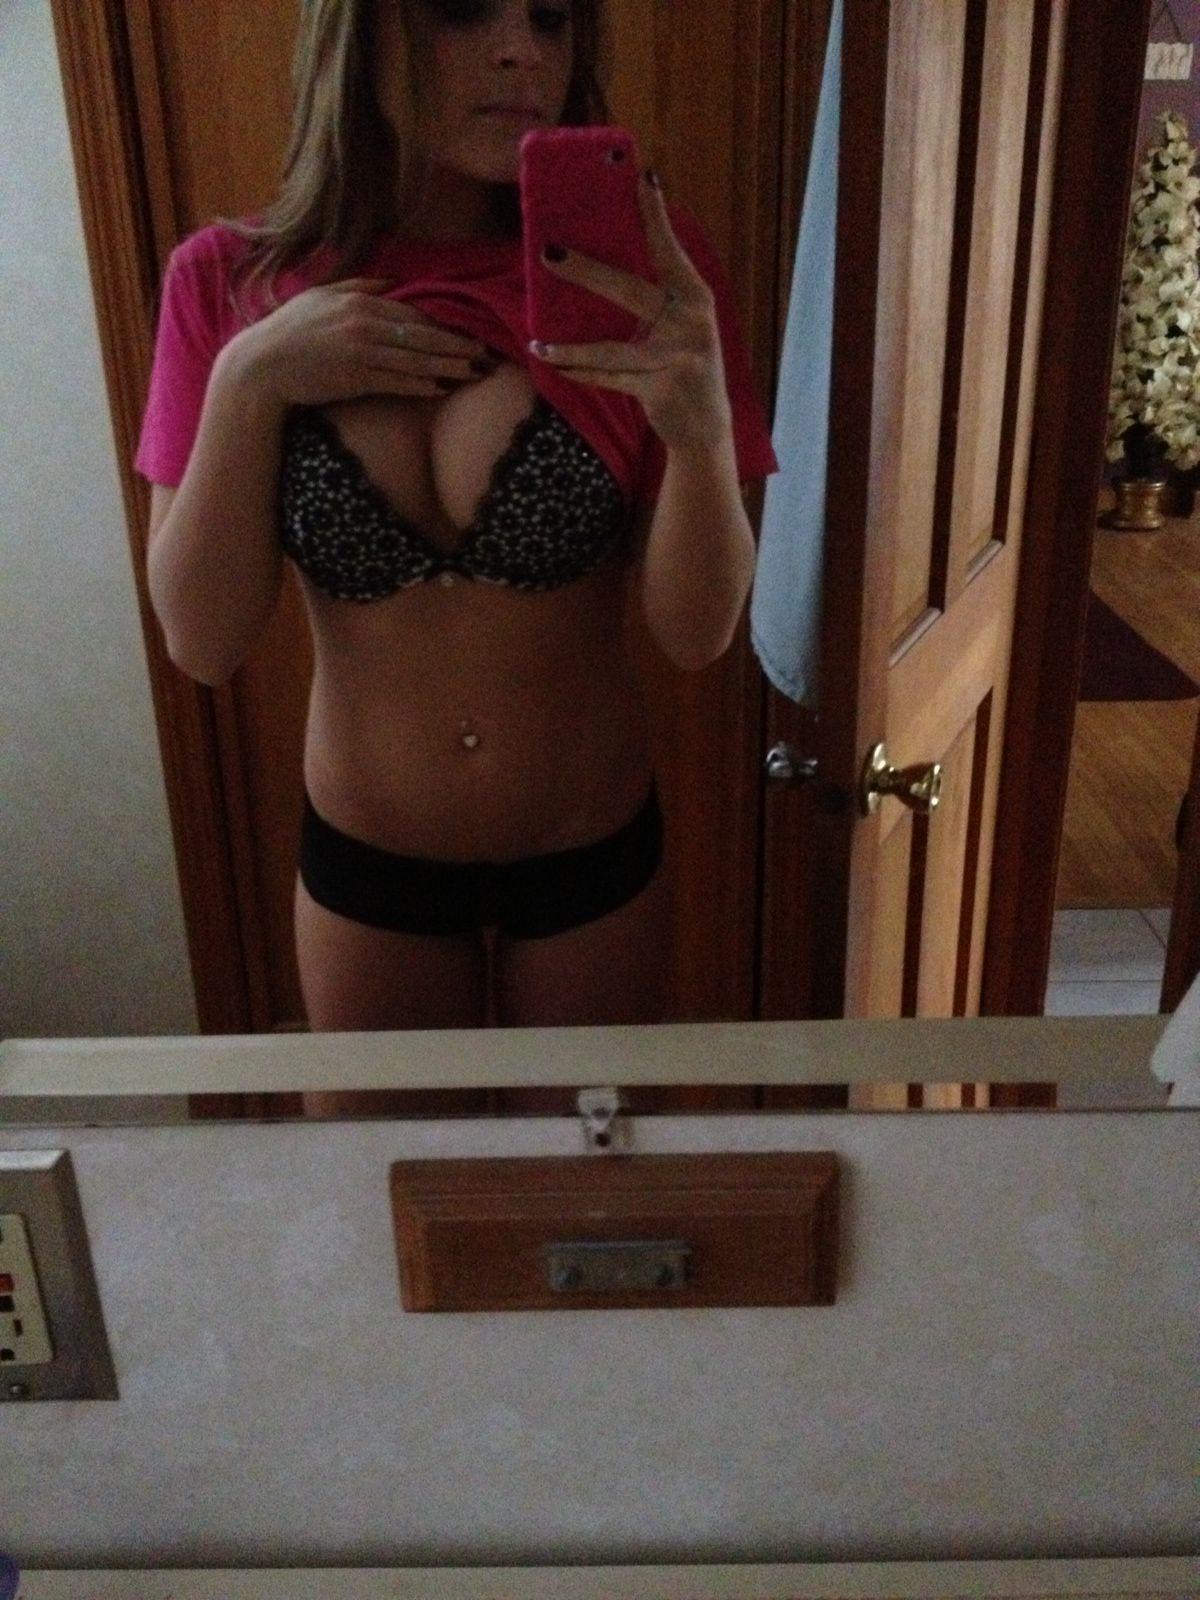 Sex Ashley Pac nudes (28 photos), Sexy, Sideboobs, Feet, butt 2017